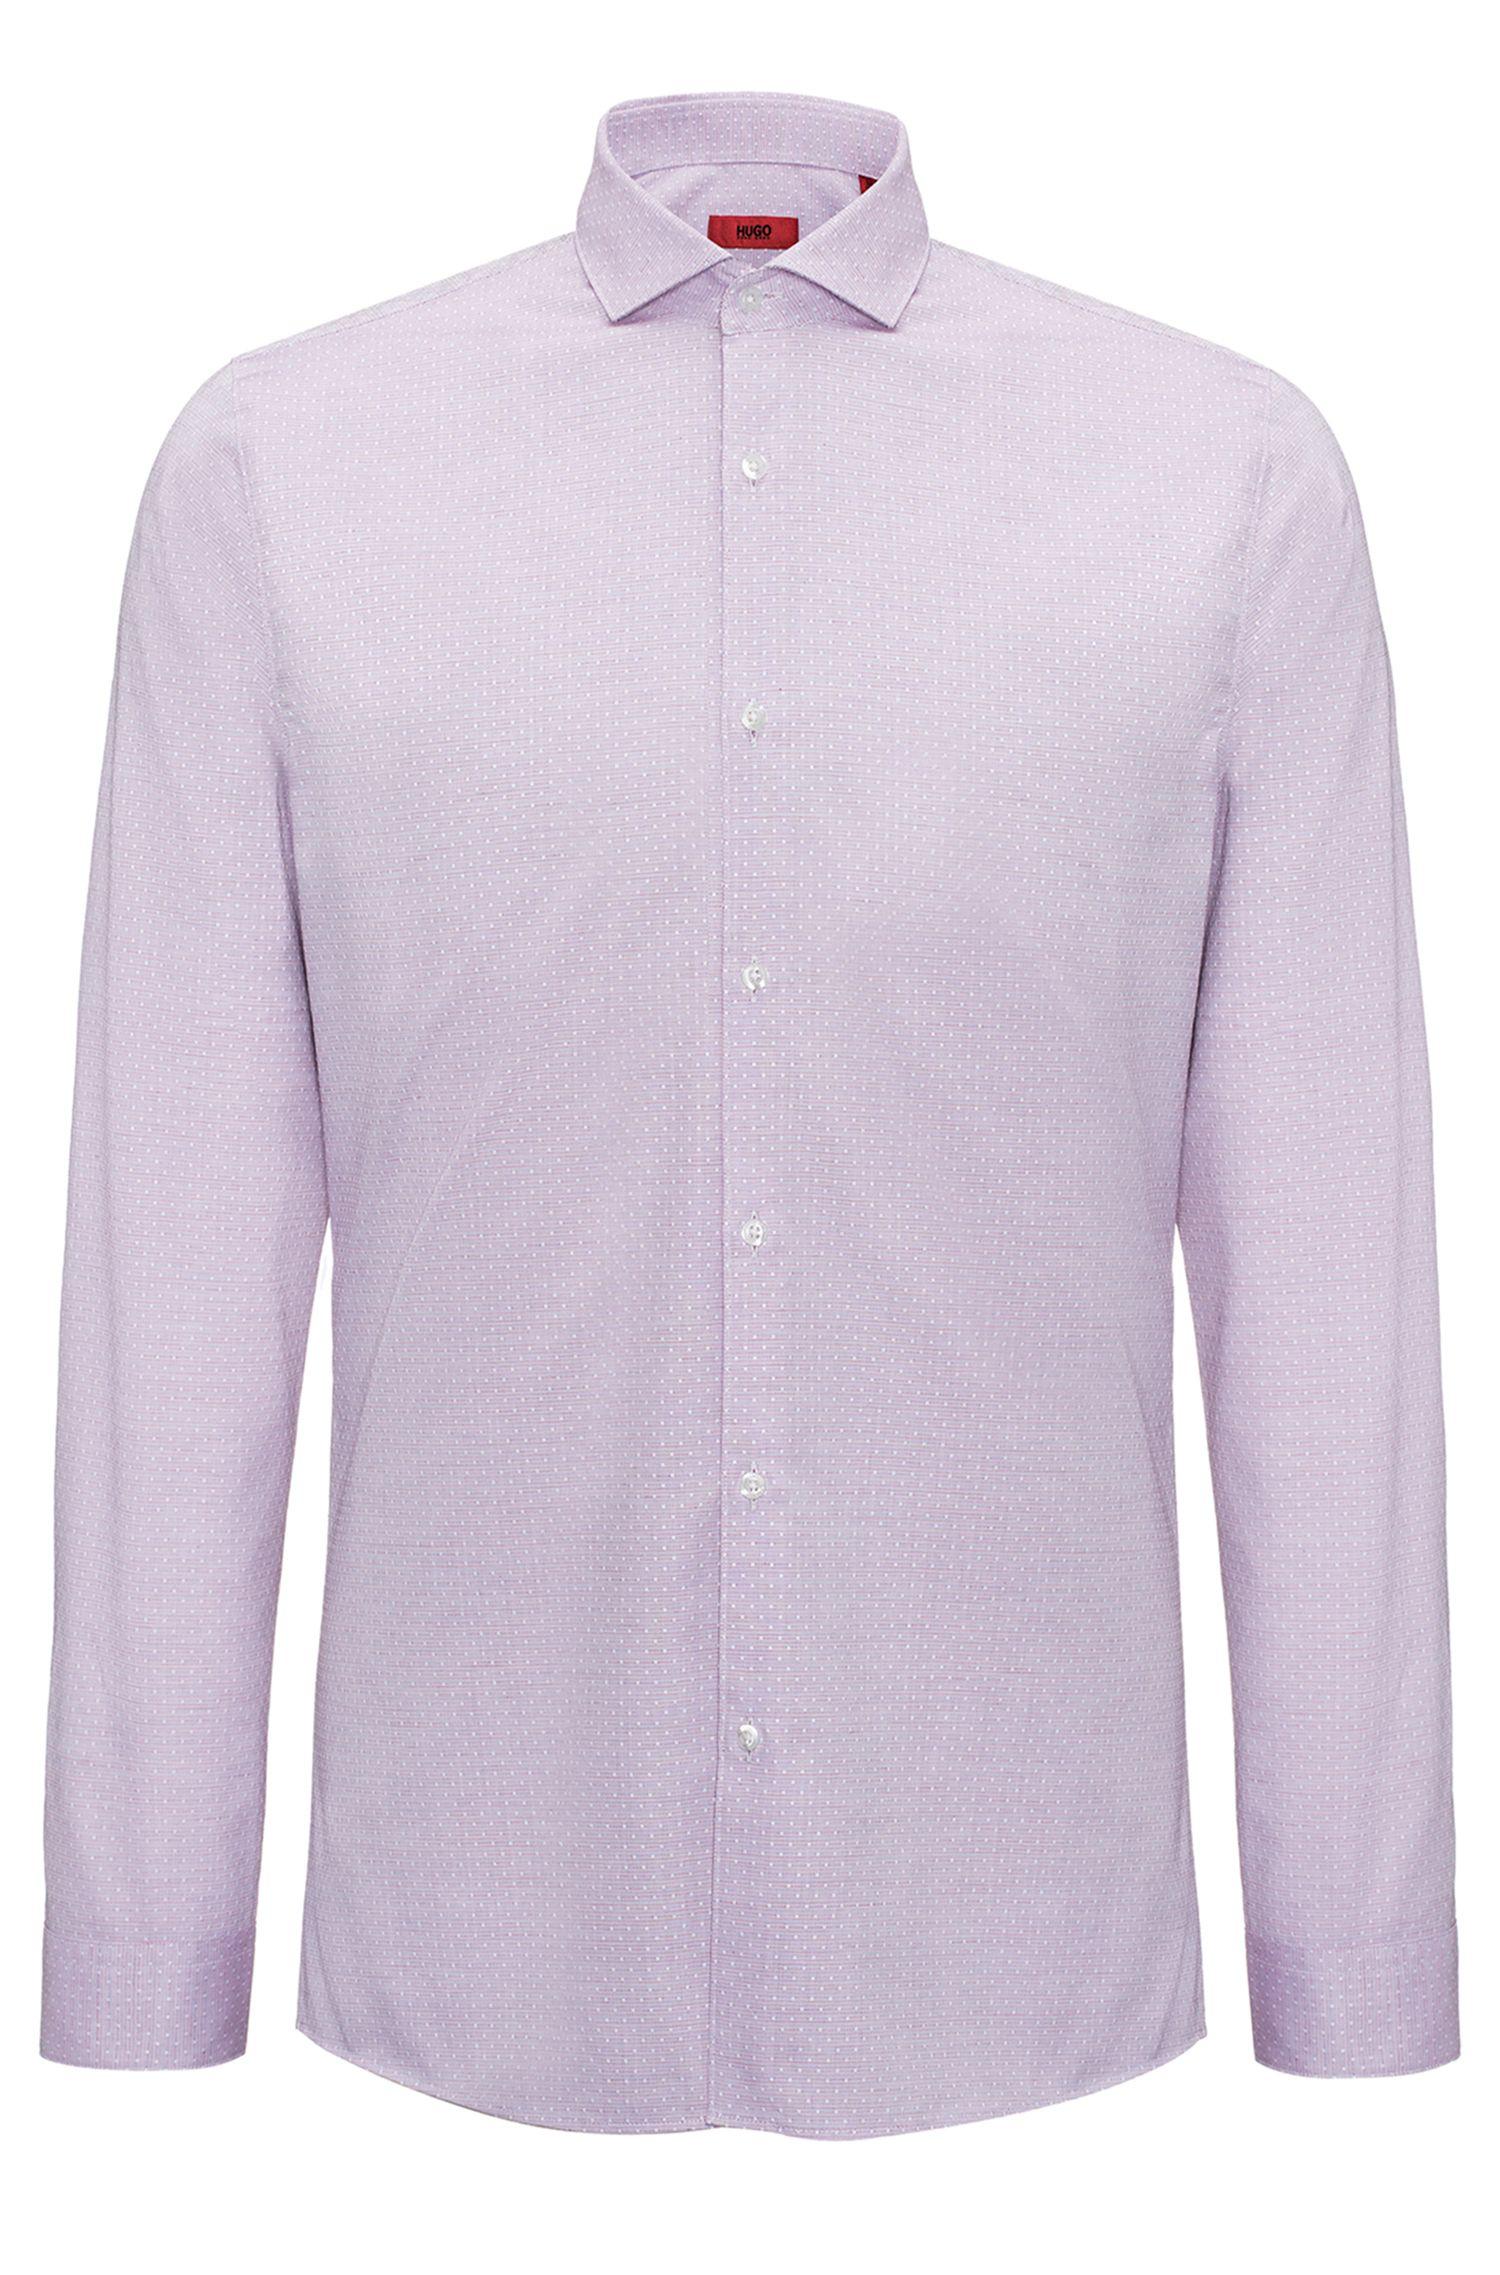 Patterned Dress Shirt, Extra Slim Fit | Erriko, Red